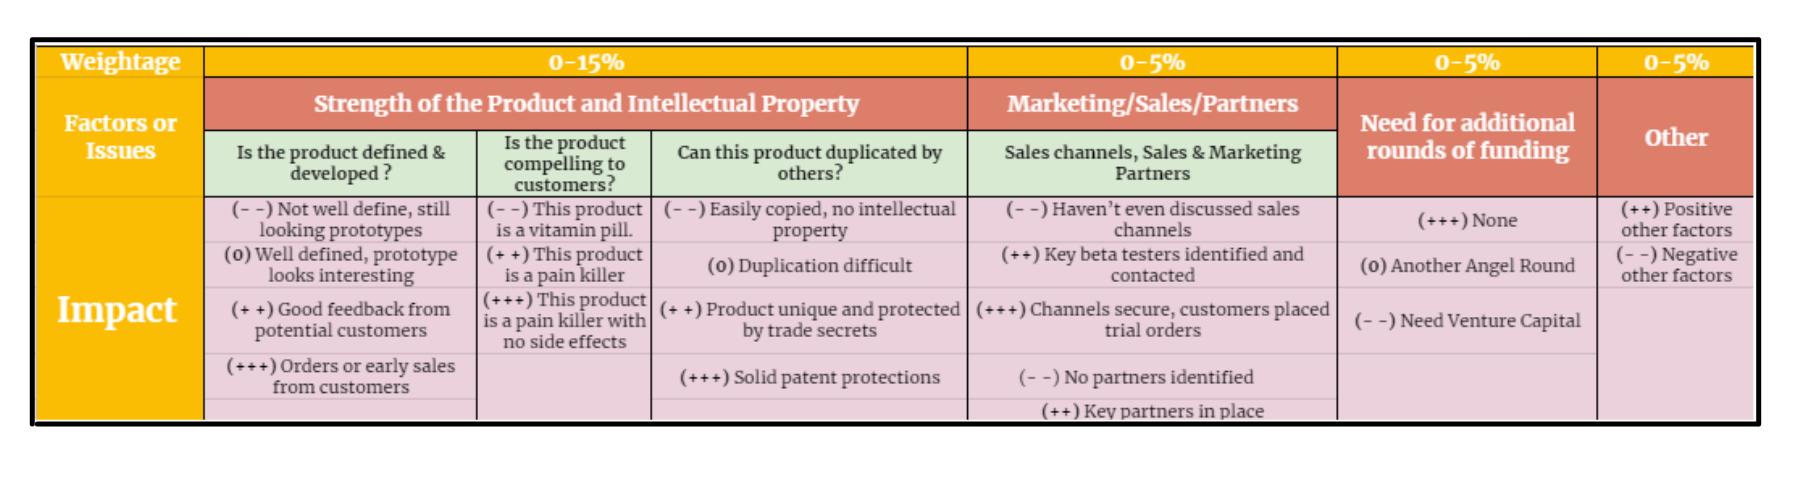 Pre-Revenue Startup Valuation Factors - Bill Payne(2)